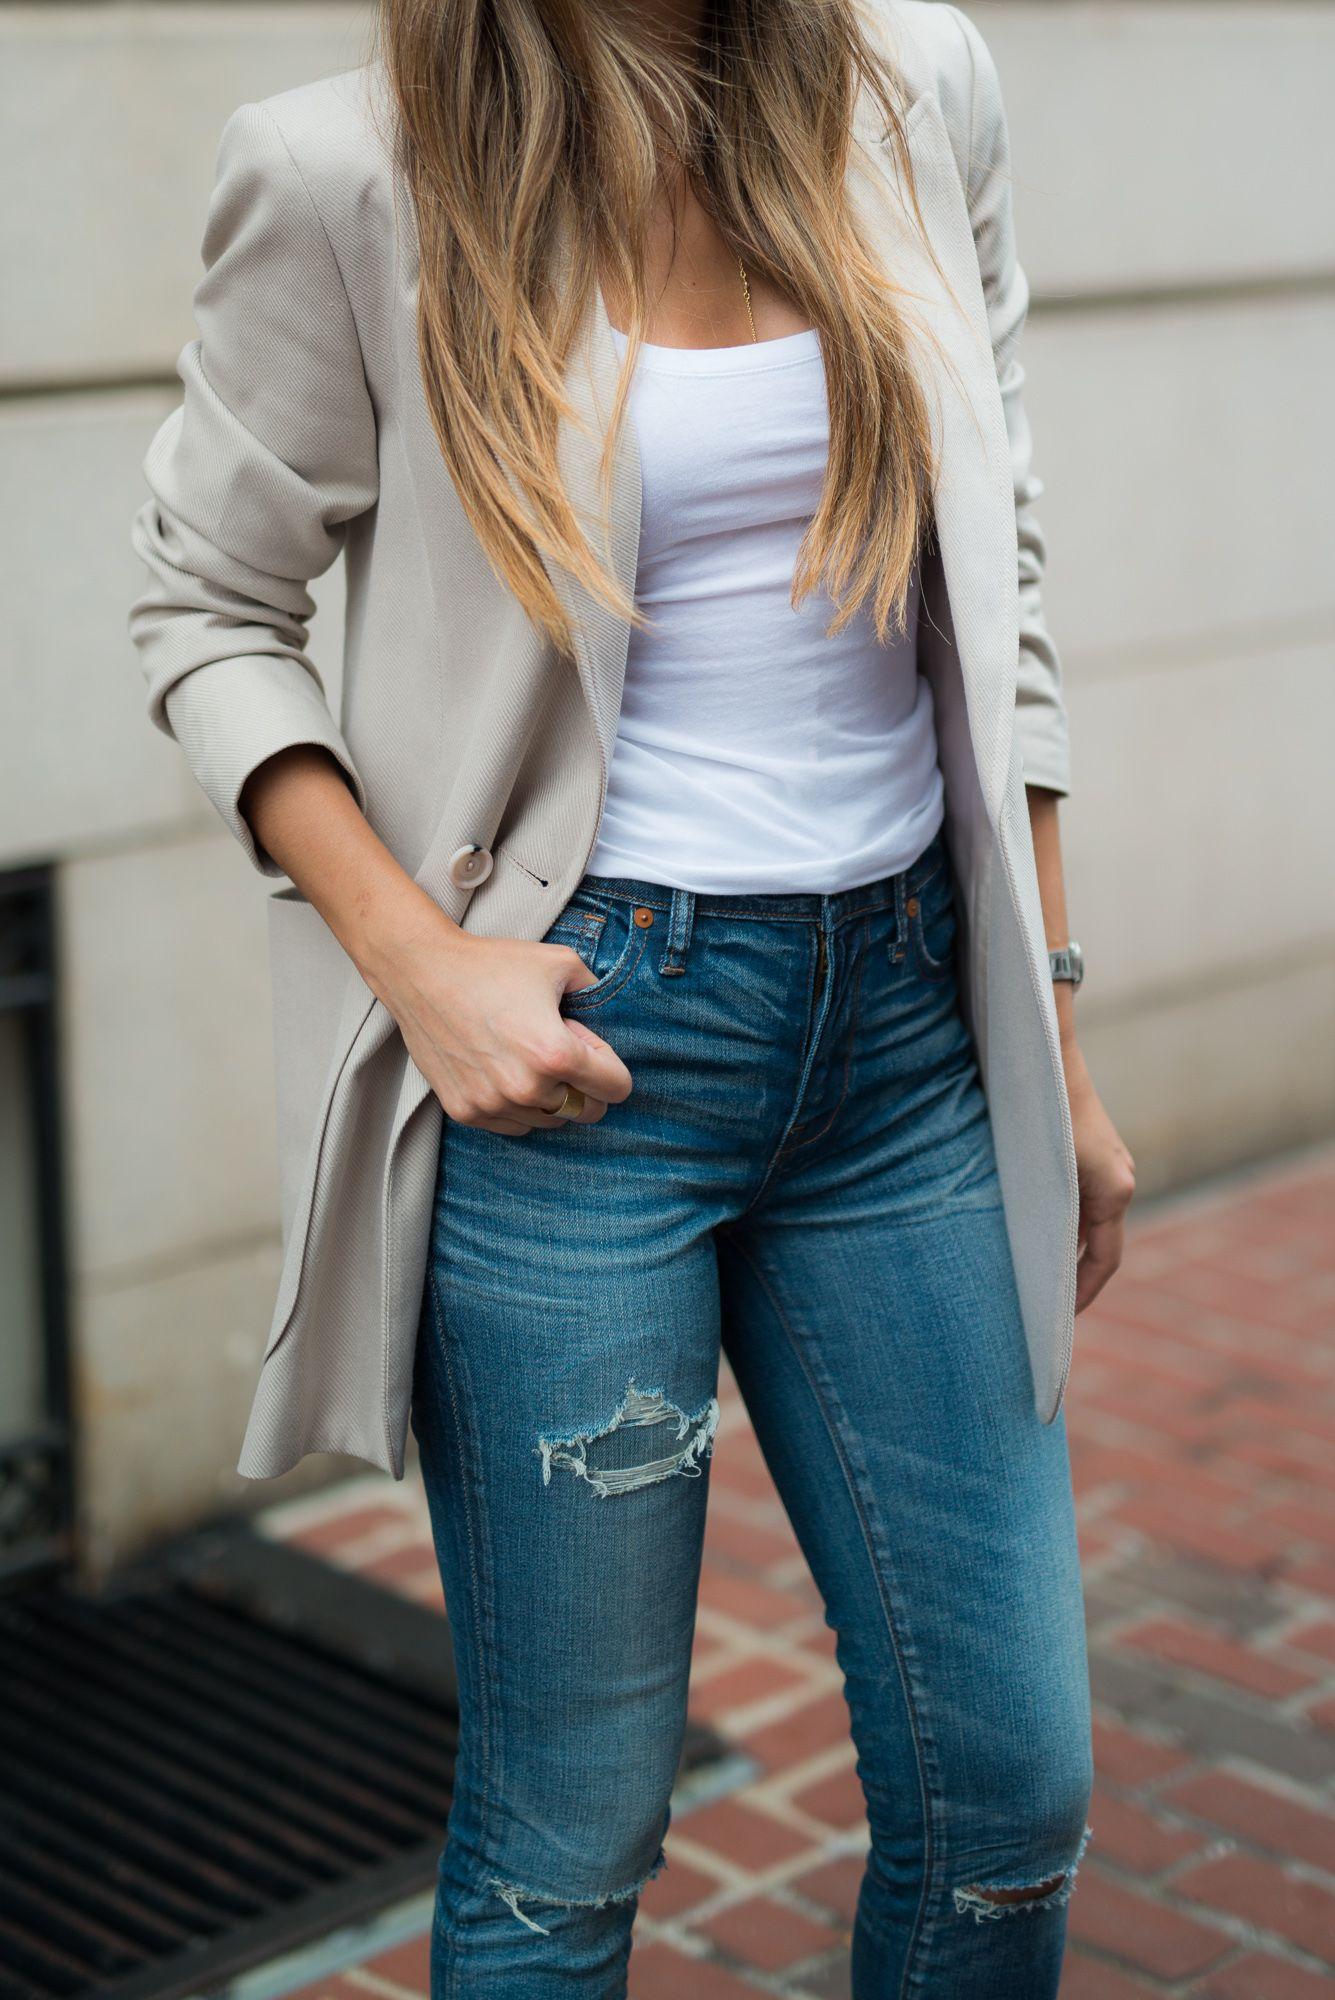 70s_Twill_Longline_Jacket_Pam_Hetlinger_The_Girl_From_Panama_high_riser_madewell_jeans-2